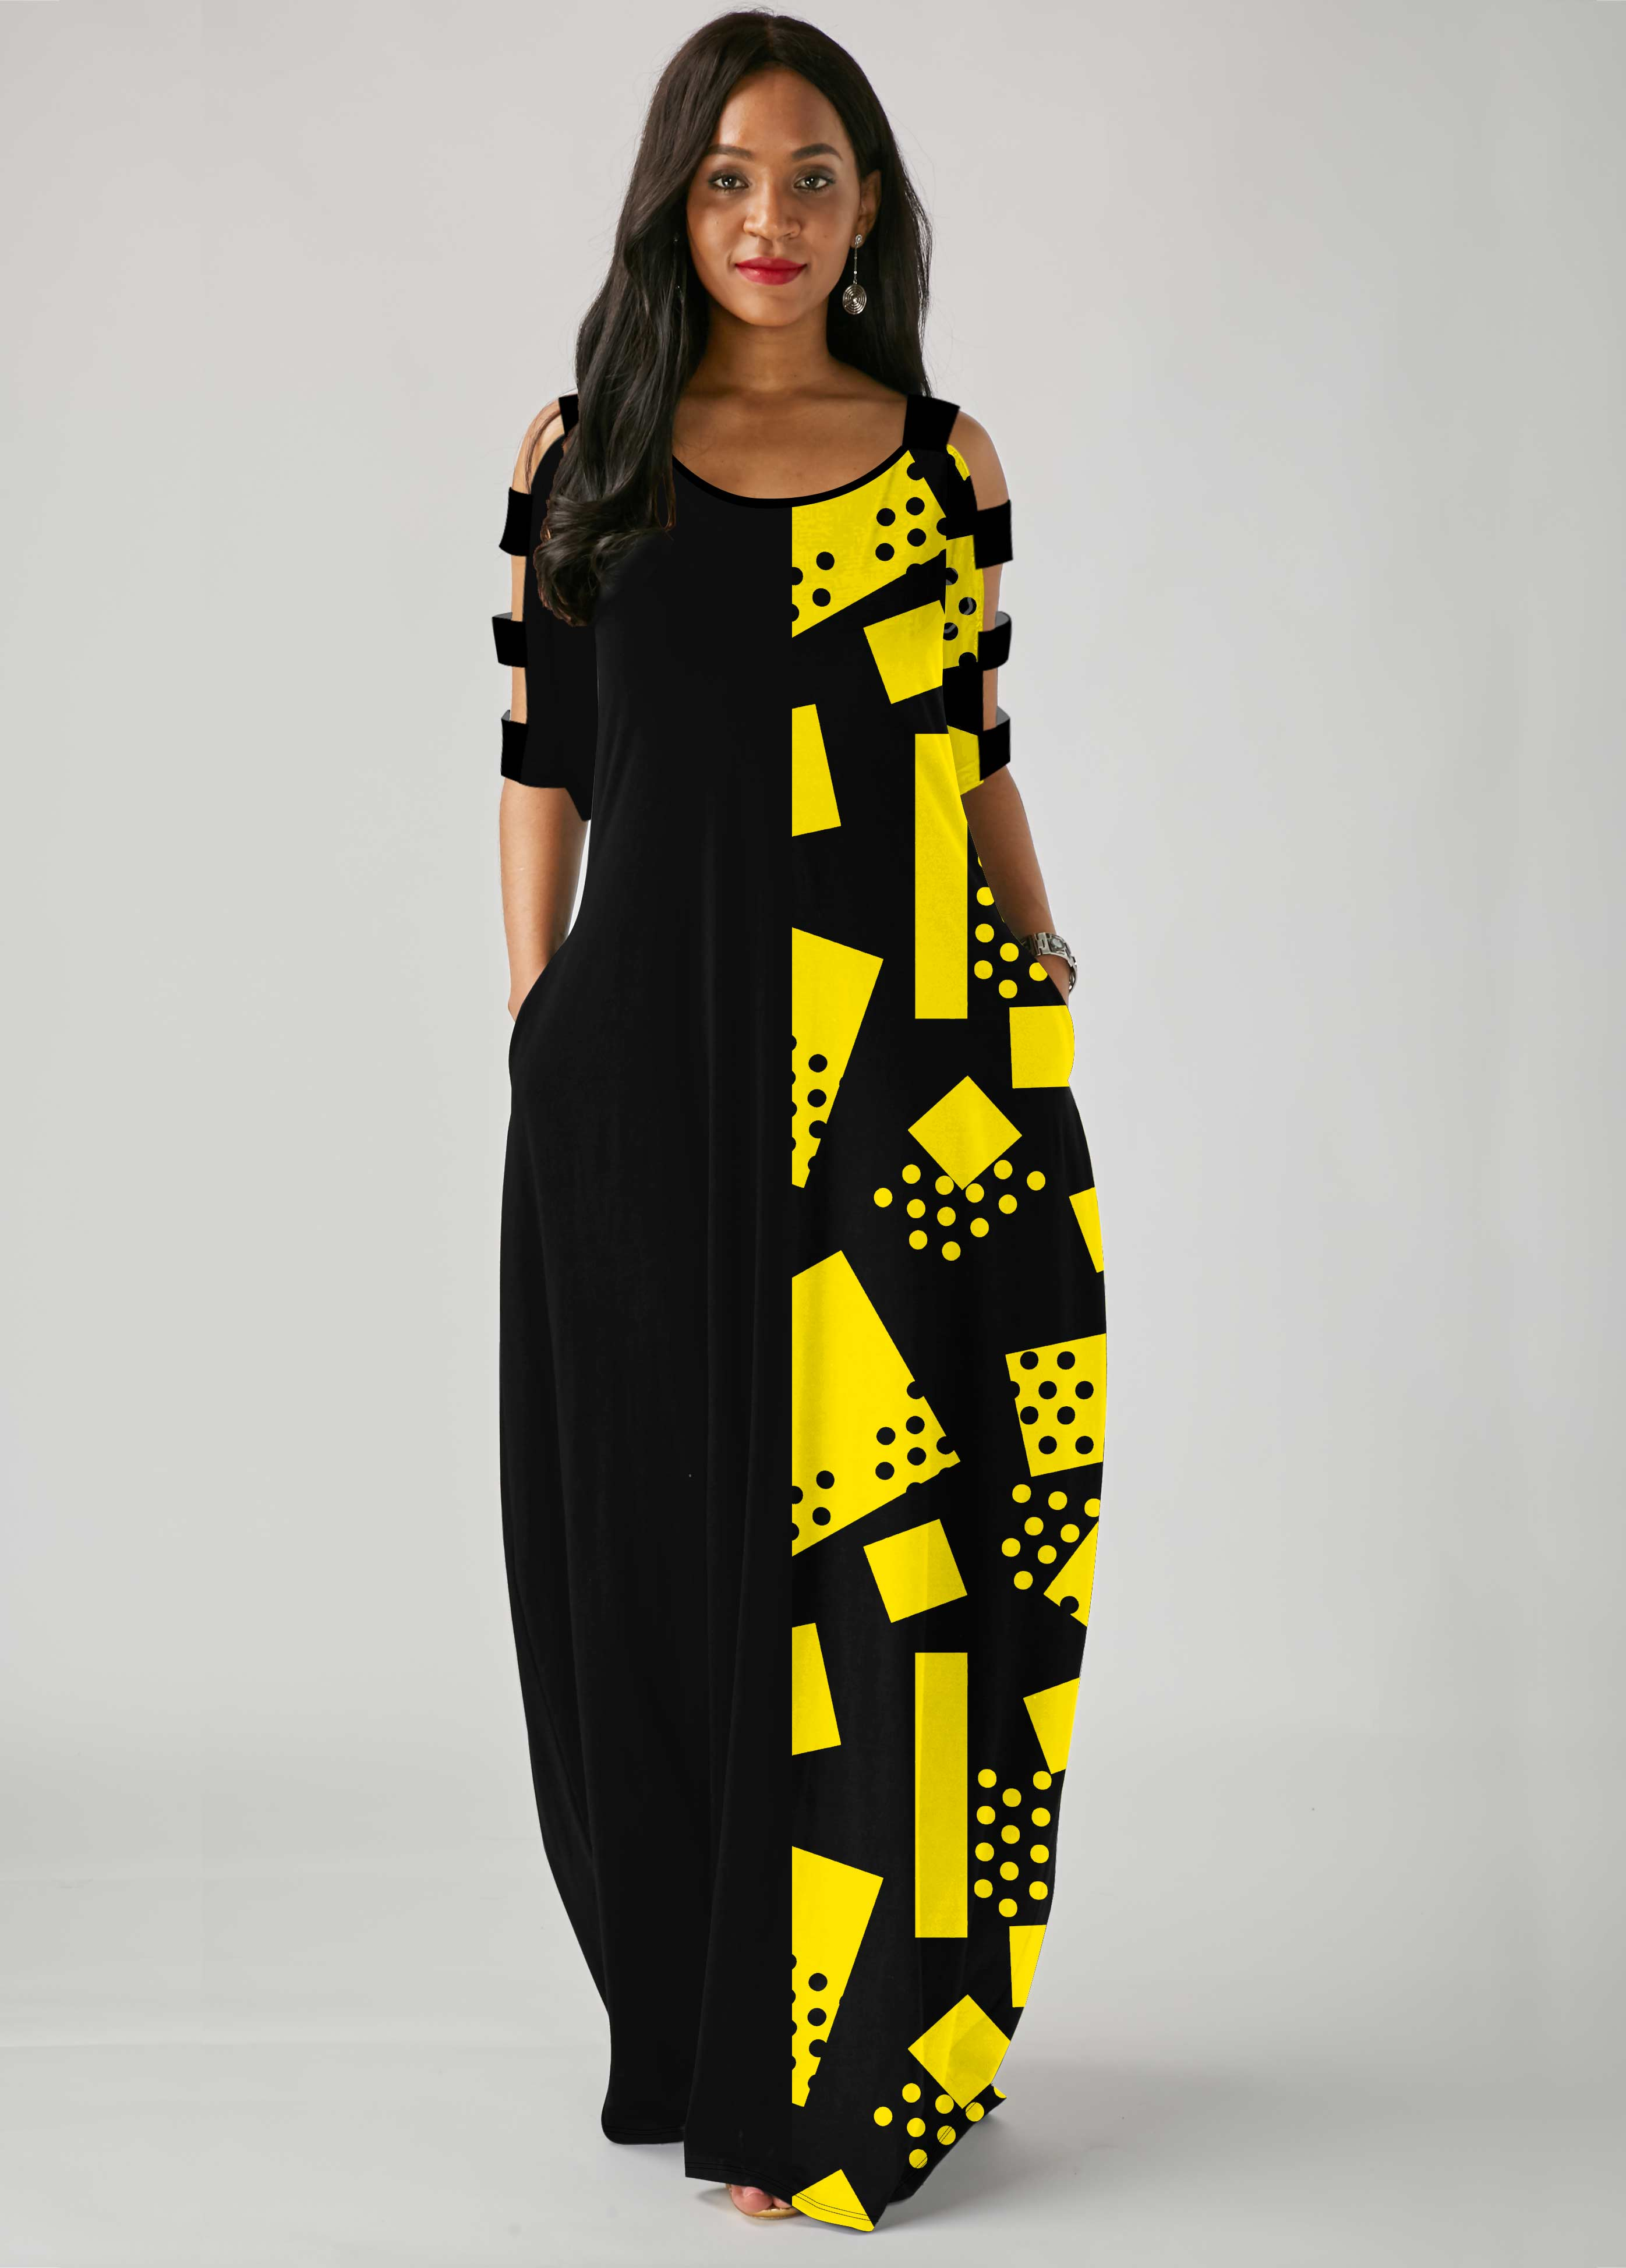 Geometric Print Ladder Cutout Sleeve Side Pocket Maxi Dress